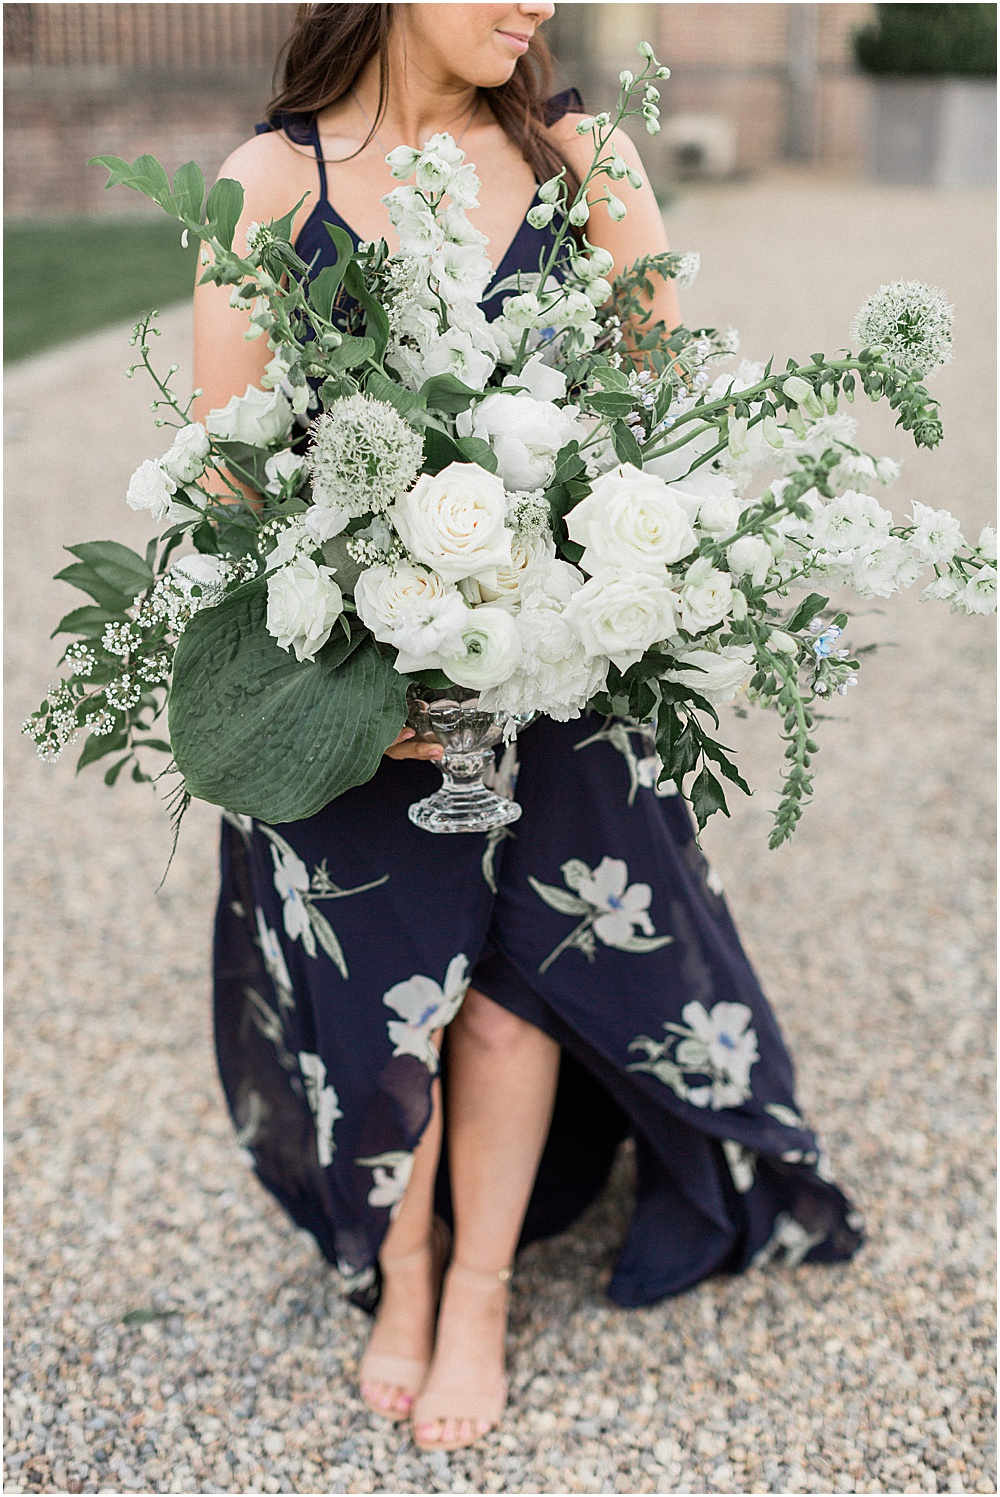 crane_estate_beach_engagement_ipswich_les_fleurs_andover_lyndsay_simon_beauty_massachusetts_boston_wedding_photographer_meredith_jane_photography_photo_0327.jpg